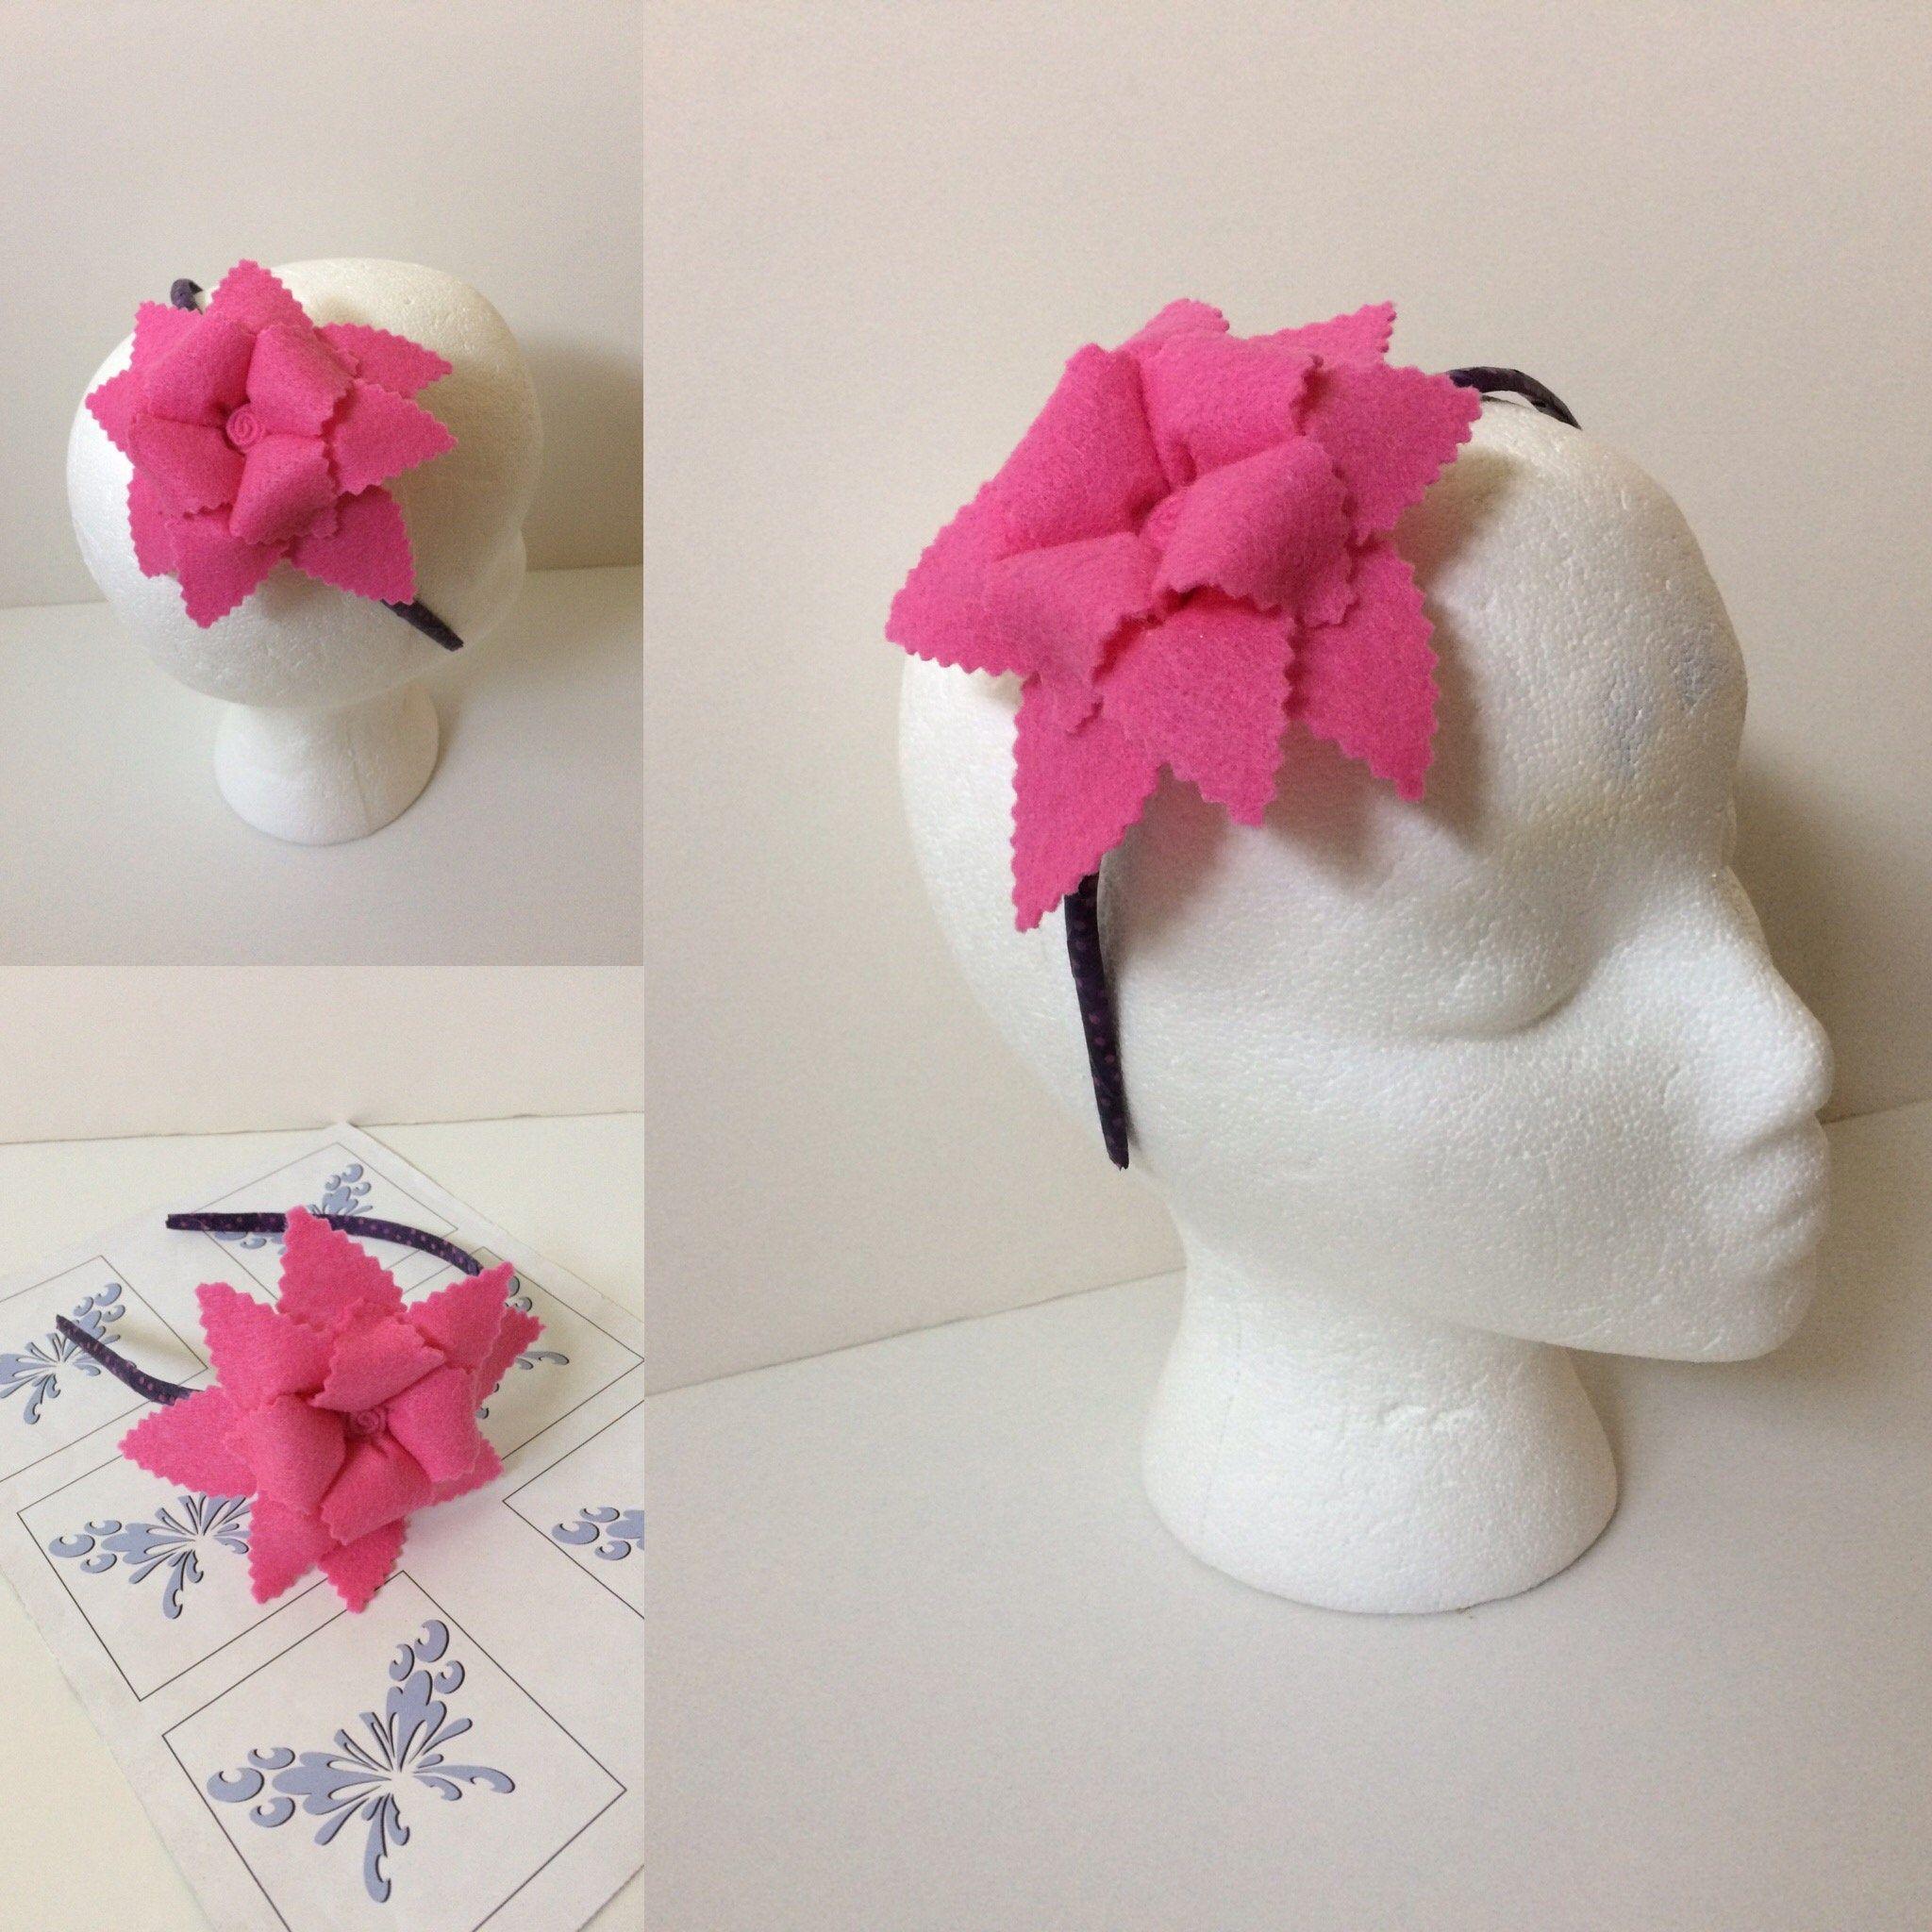 Flower Headband Pink, Felt Flower Headbands #feltflowerheadbands